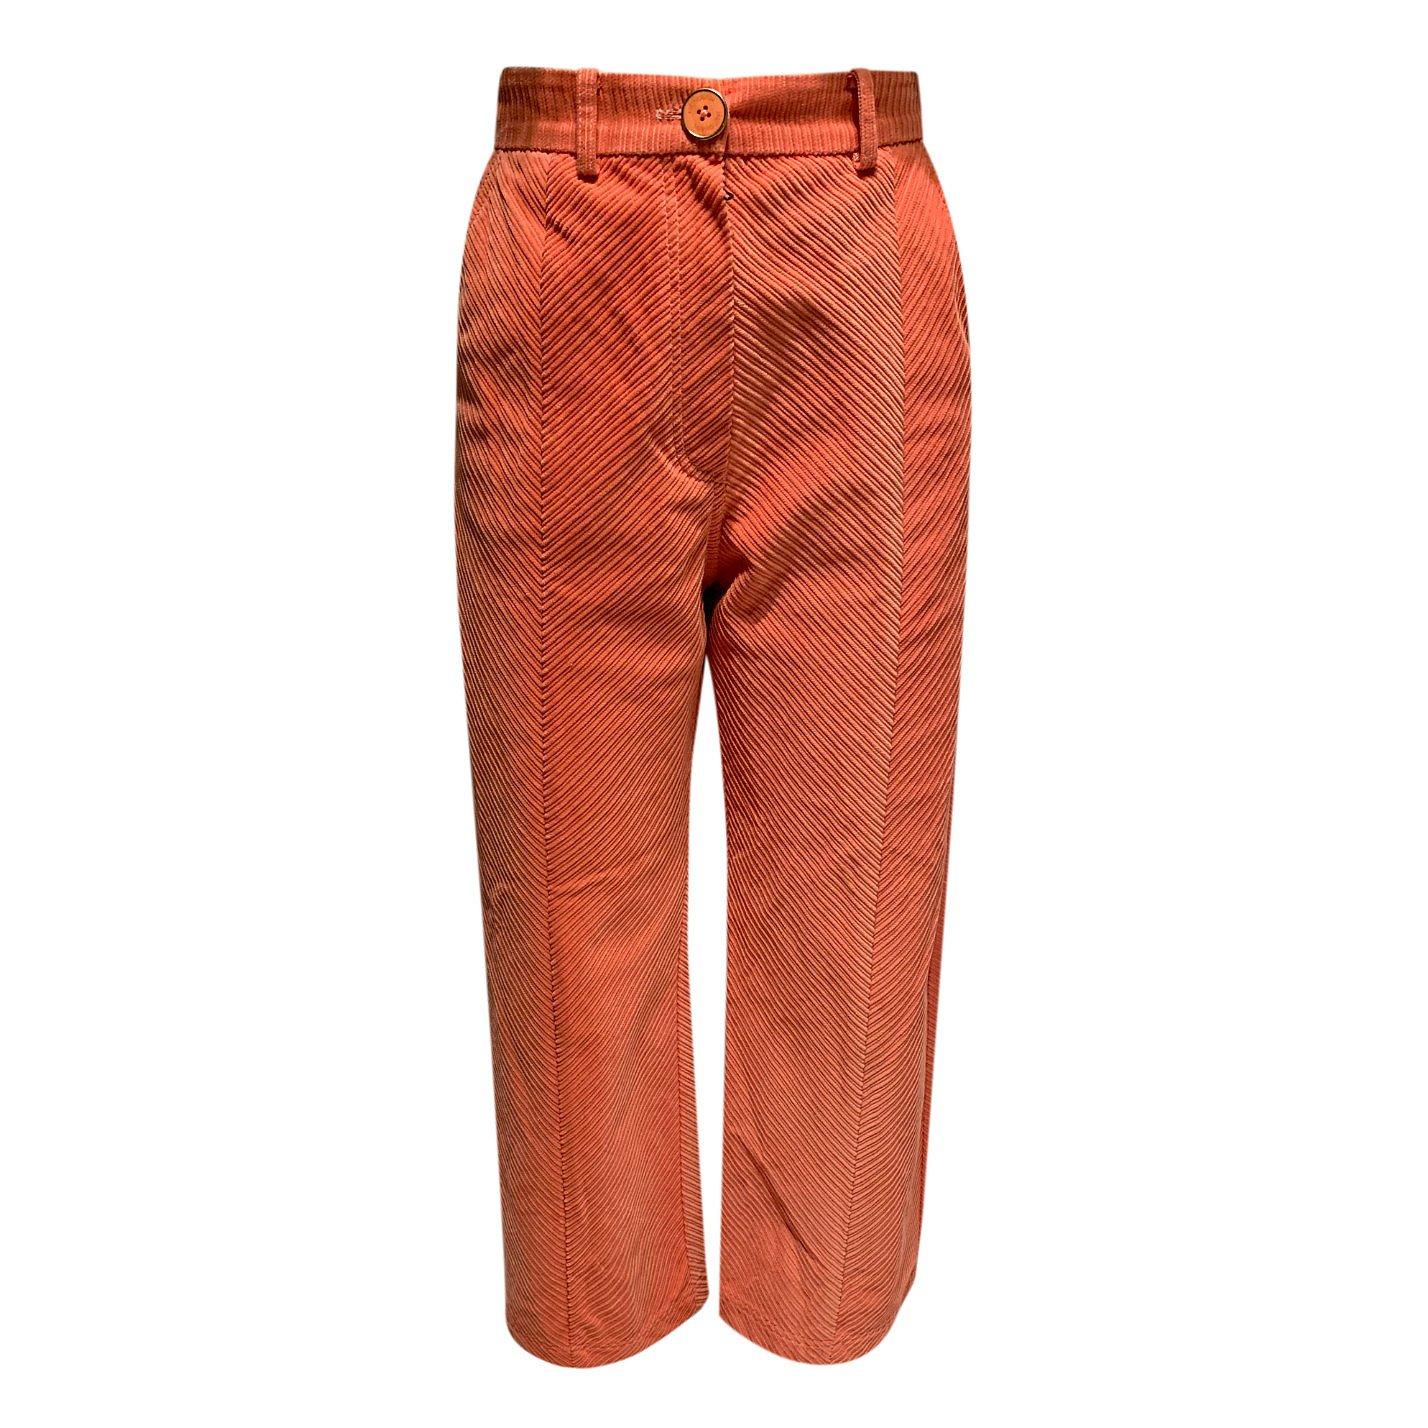 Manoush Corduroy Trousers